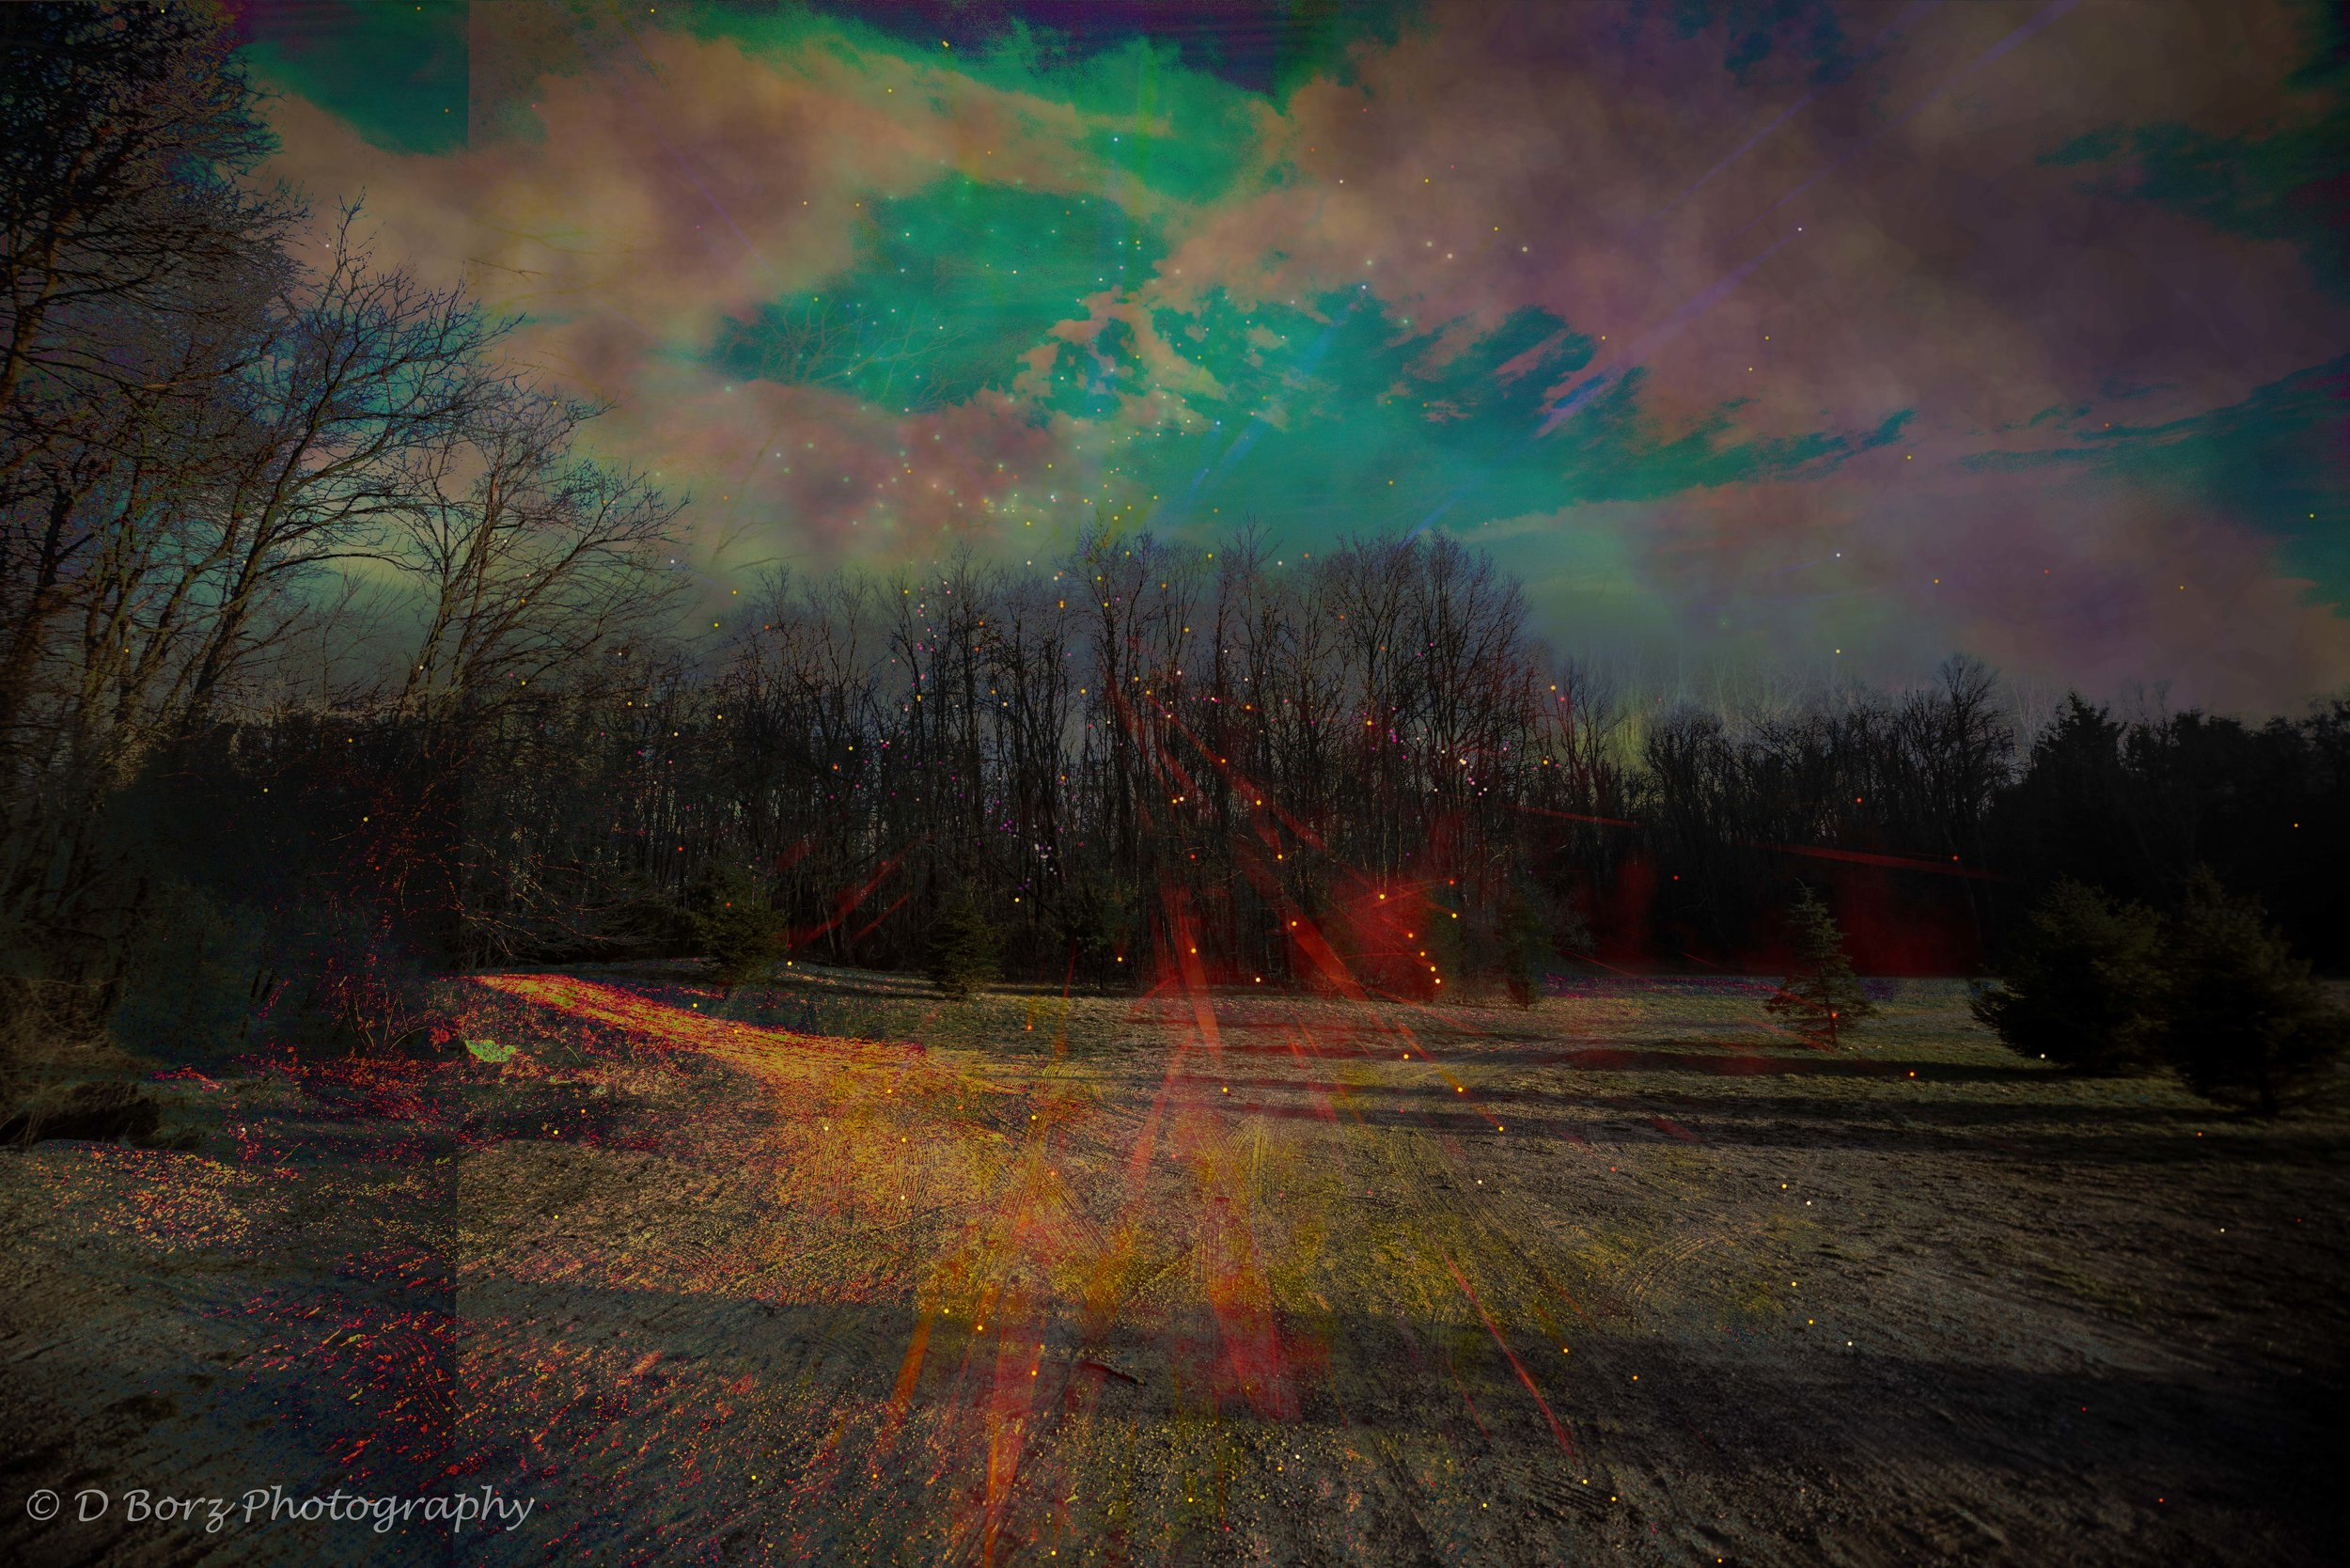 borzkowski_d_soundscape-13.jpg